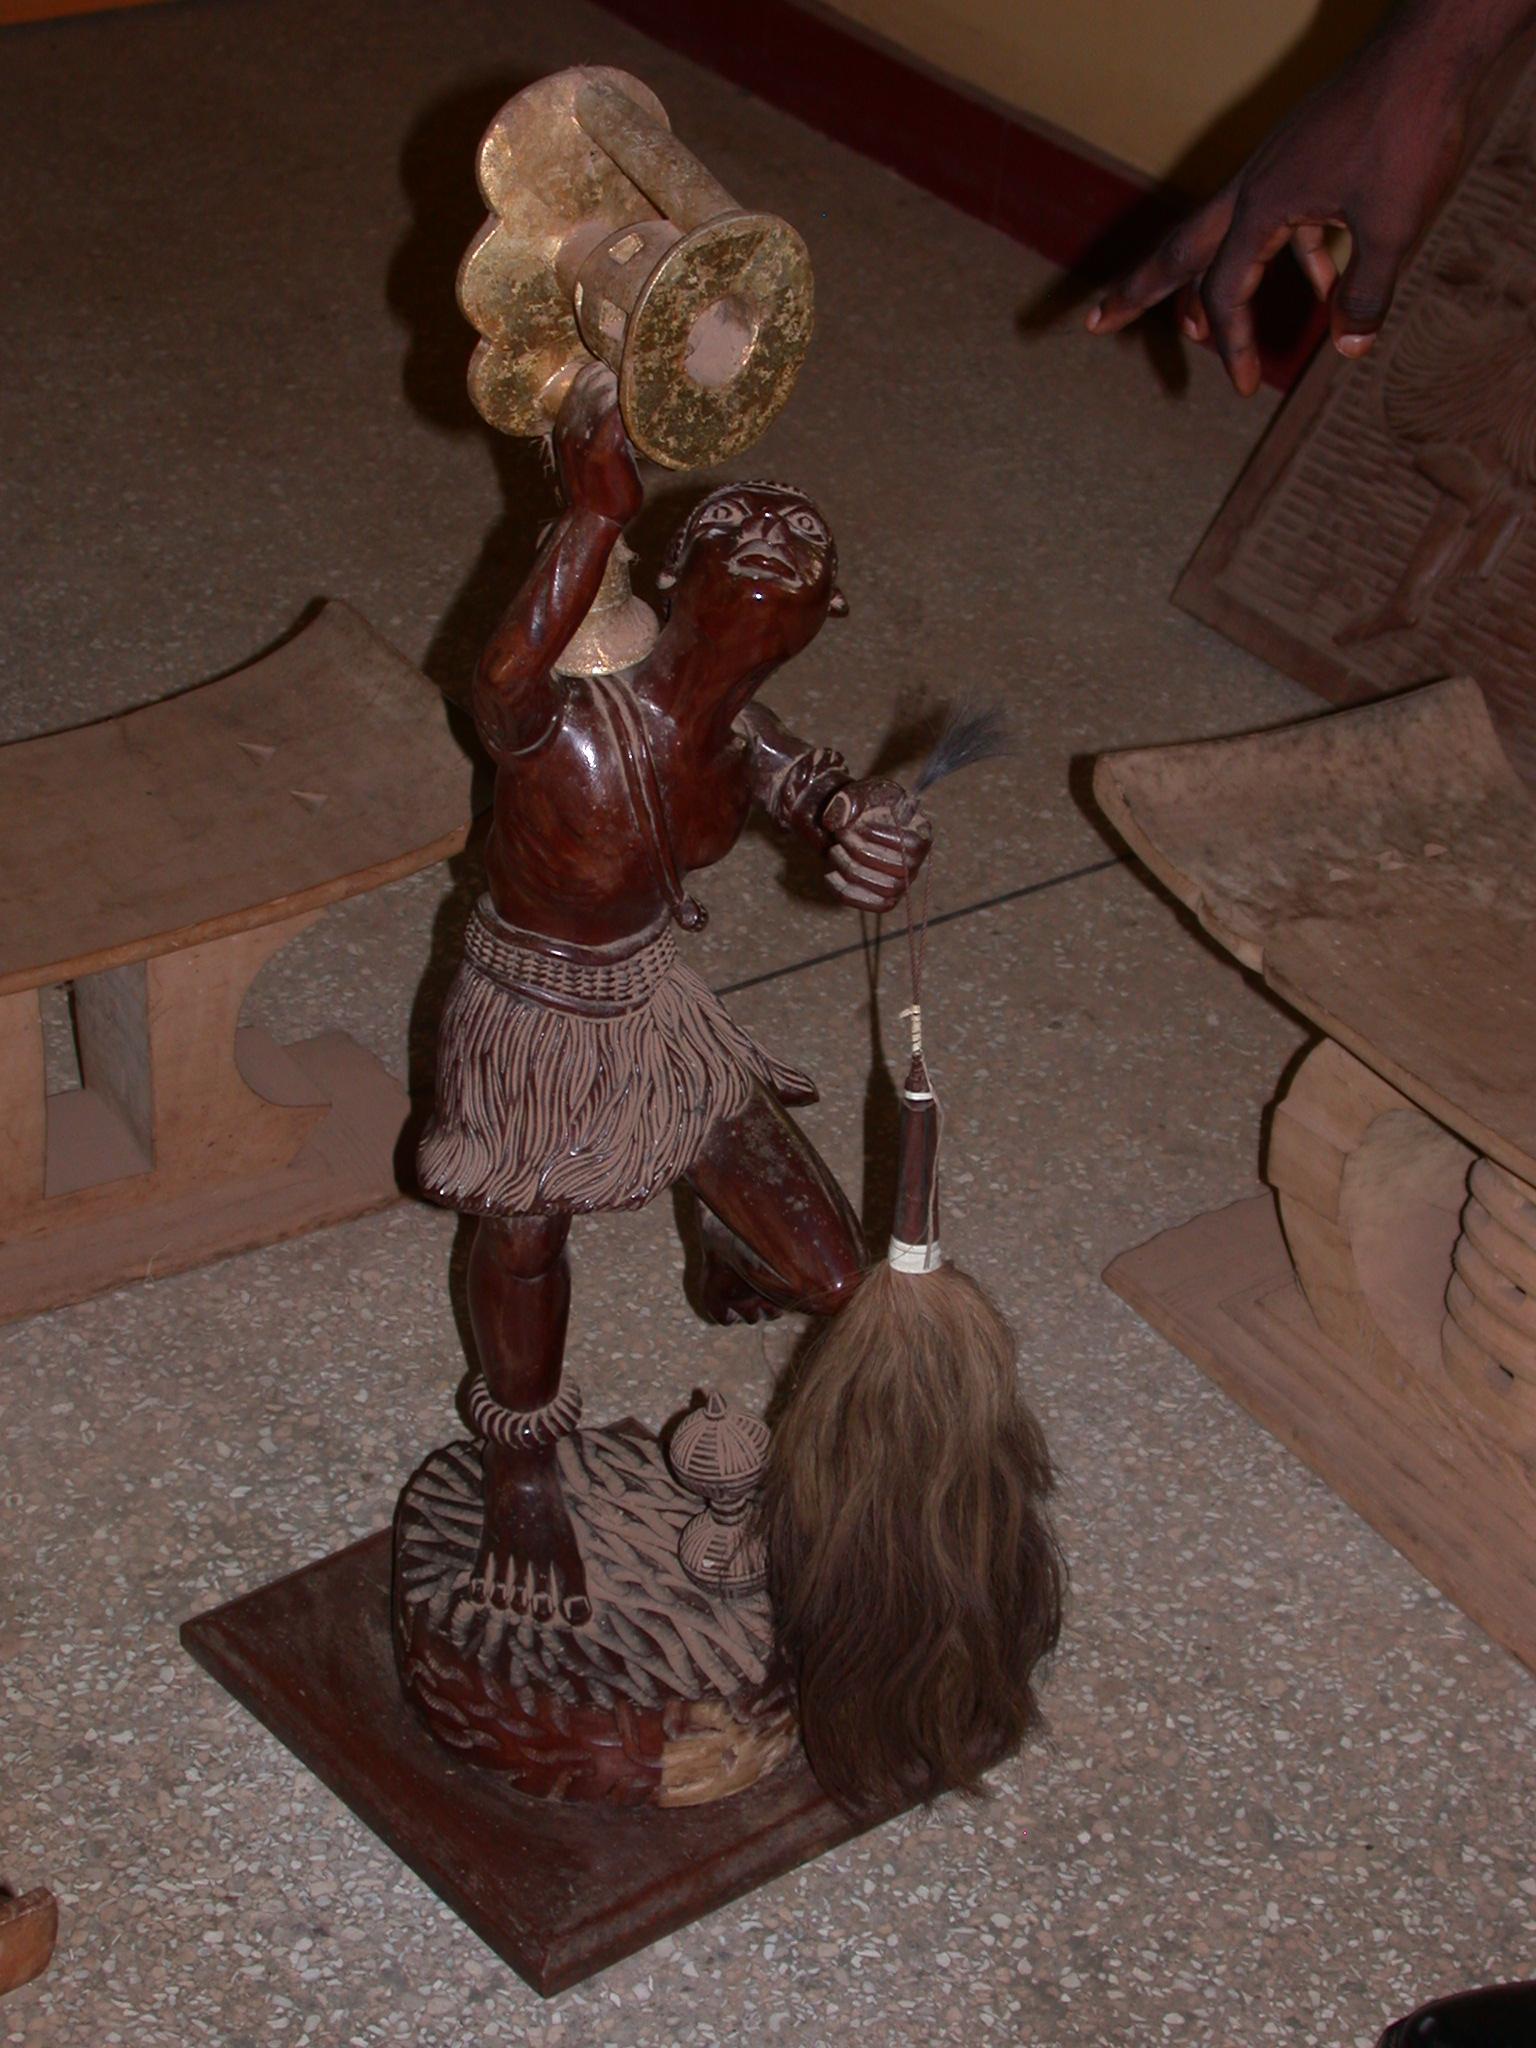 Sculpture of Okomfo Anokye Receiving the Golden Stool, Okomfo Anokye Sword Site, Kumasi, Ghana